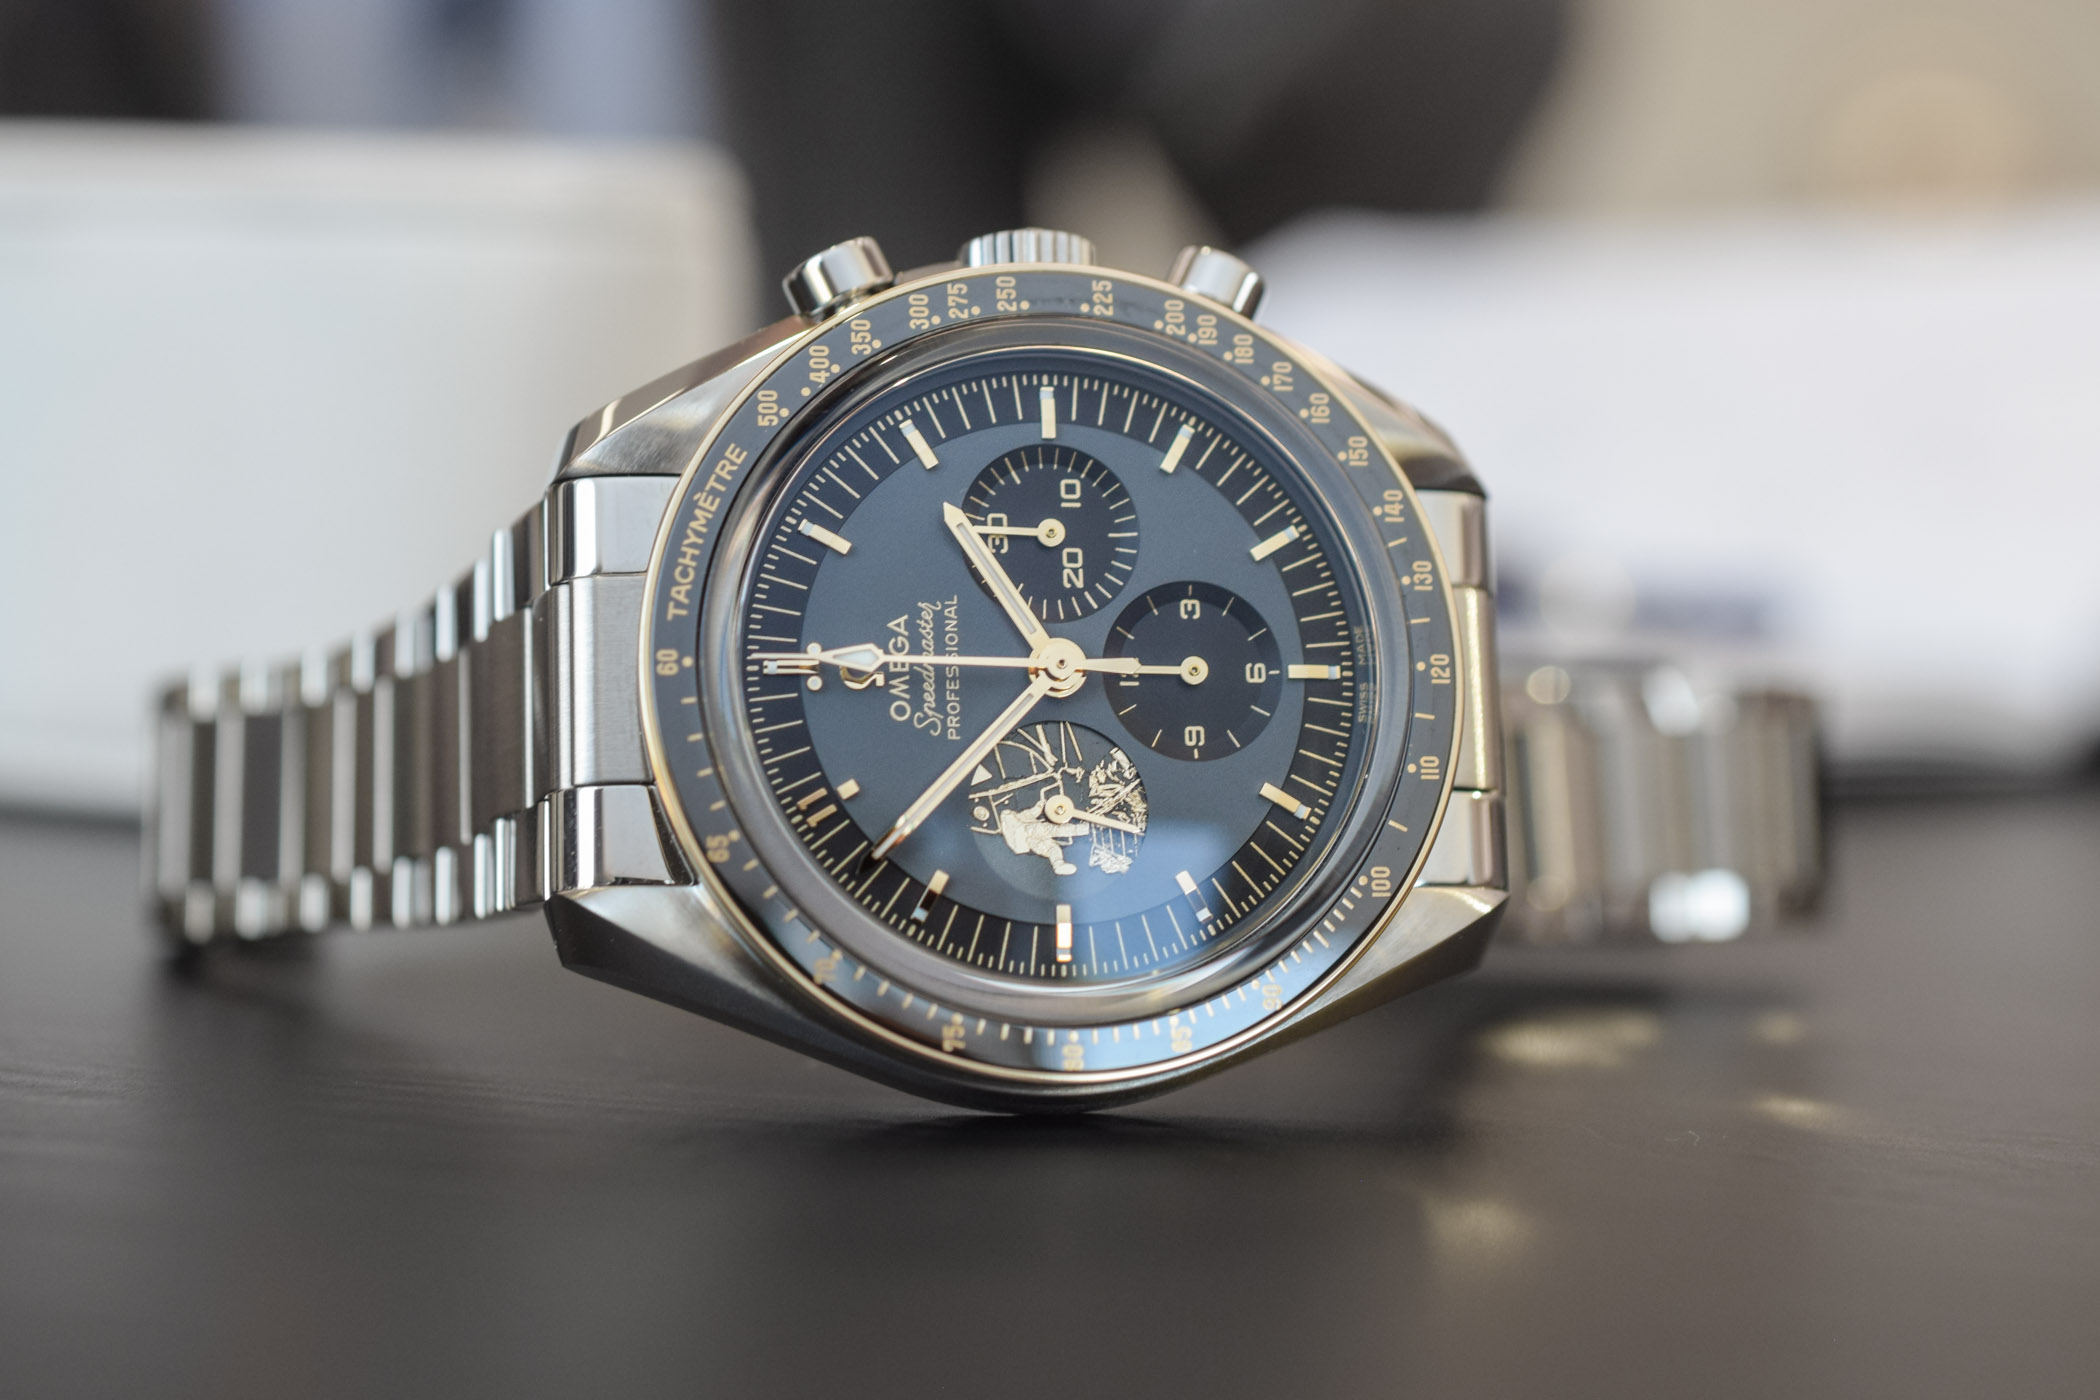 OMEGA Speedmaster Apollo 11 50th Anniversary Limited Edition Steel 310.20.42.50.01.001